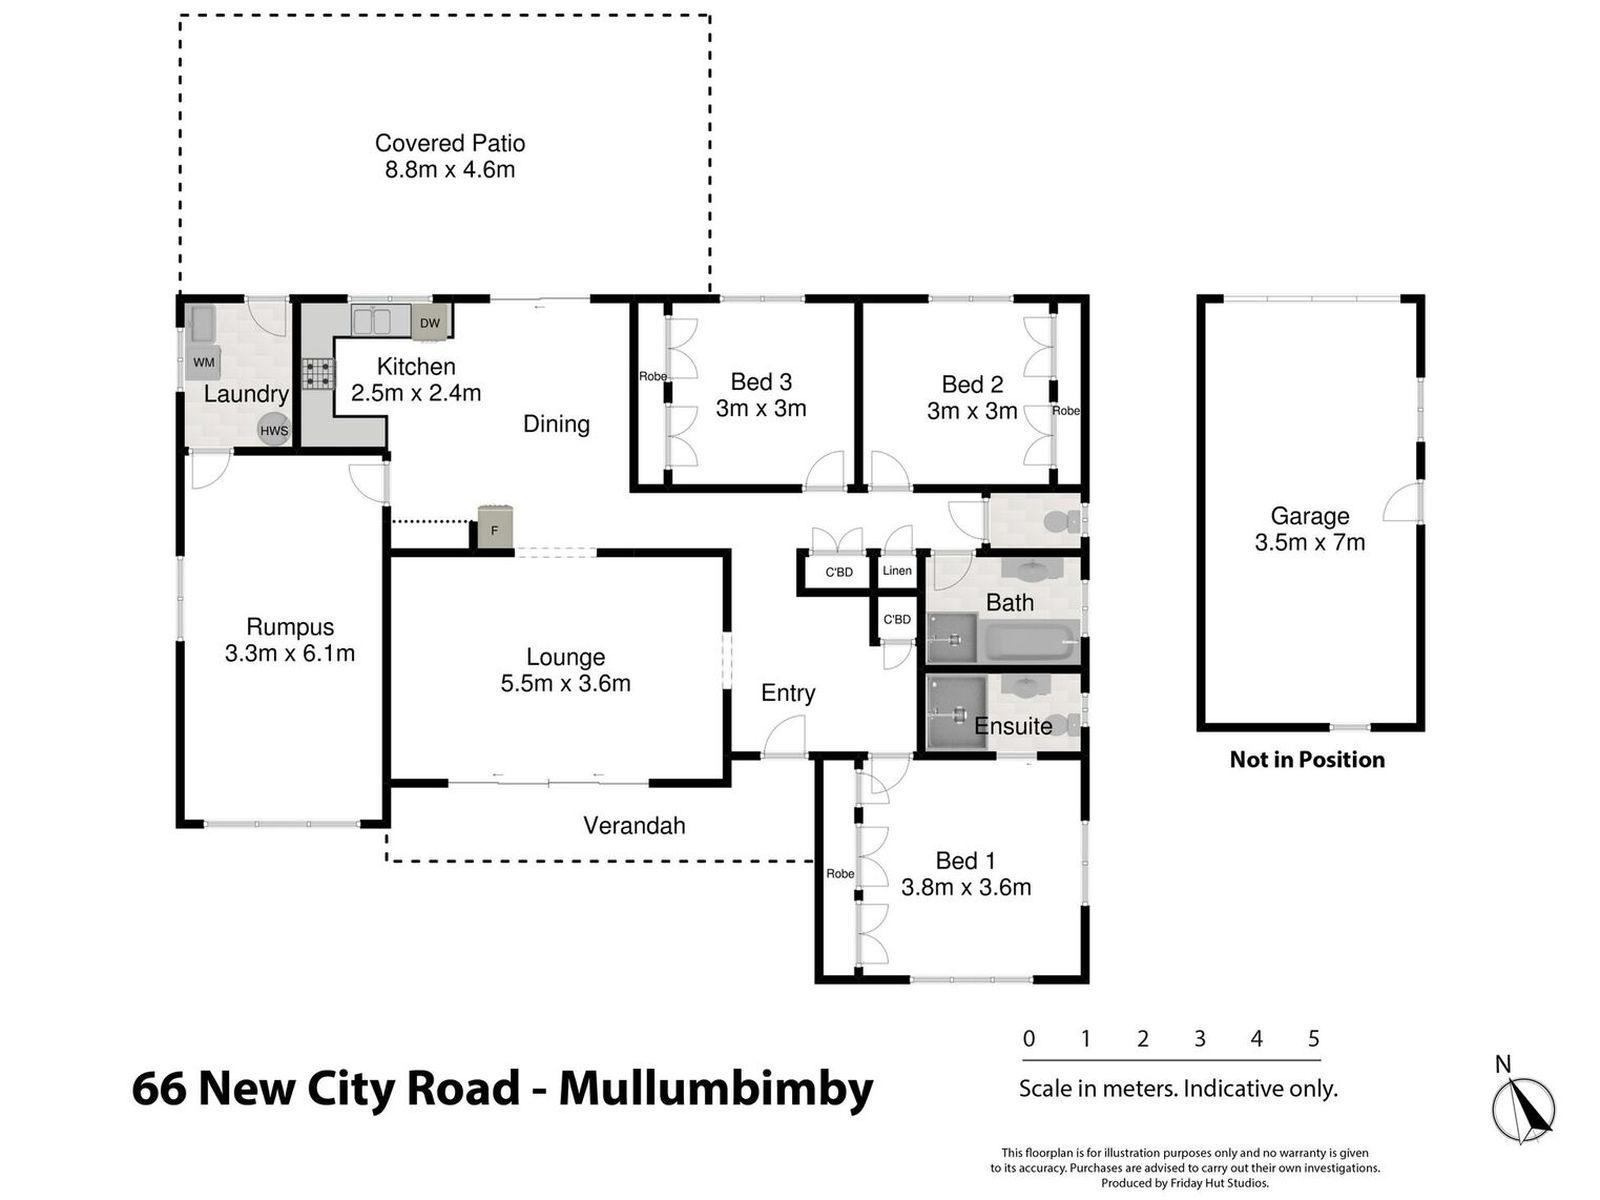 66-68 New City Road, Mullumbimby